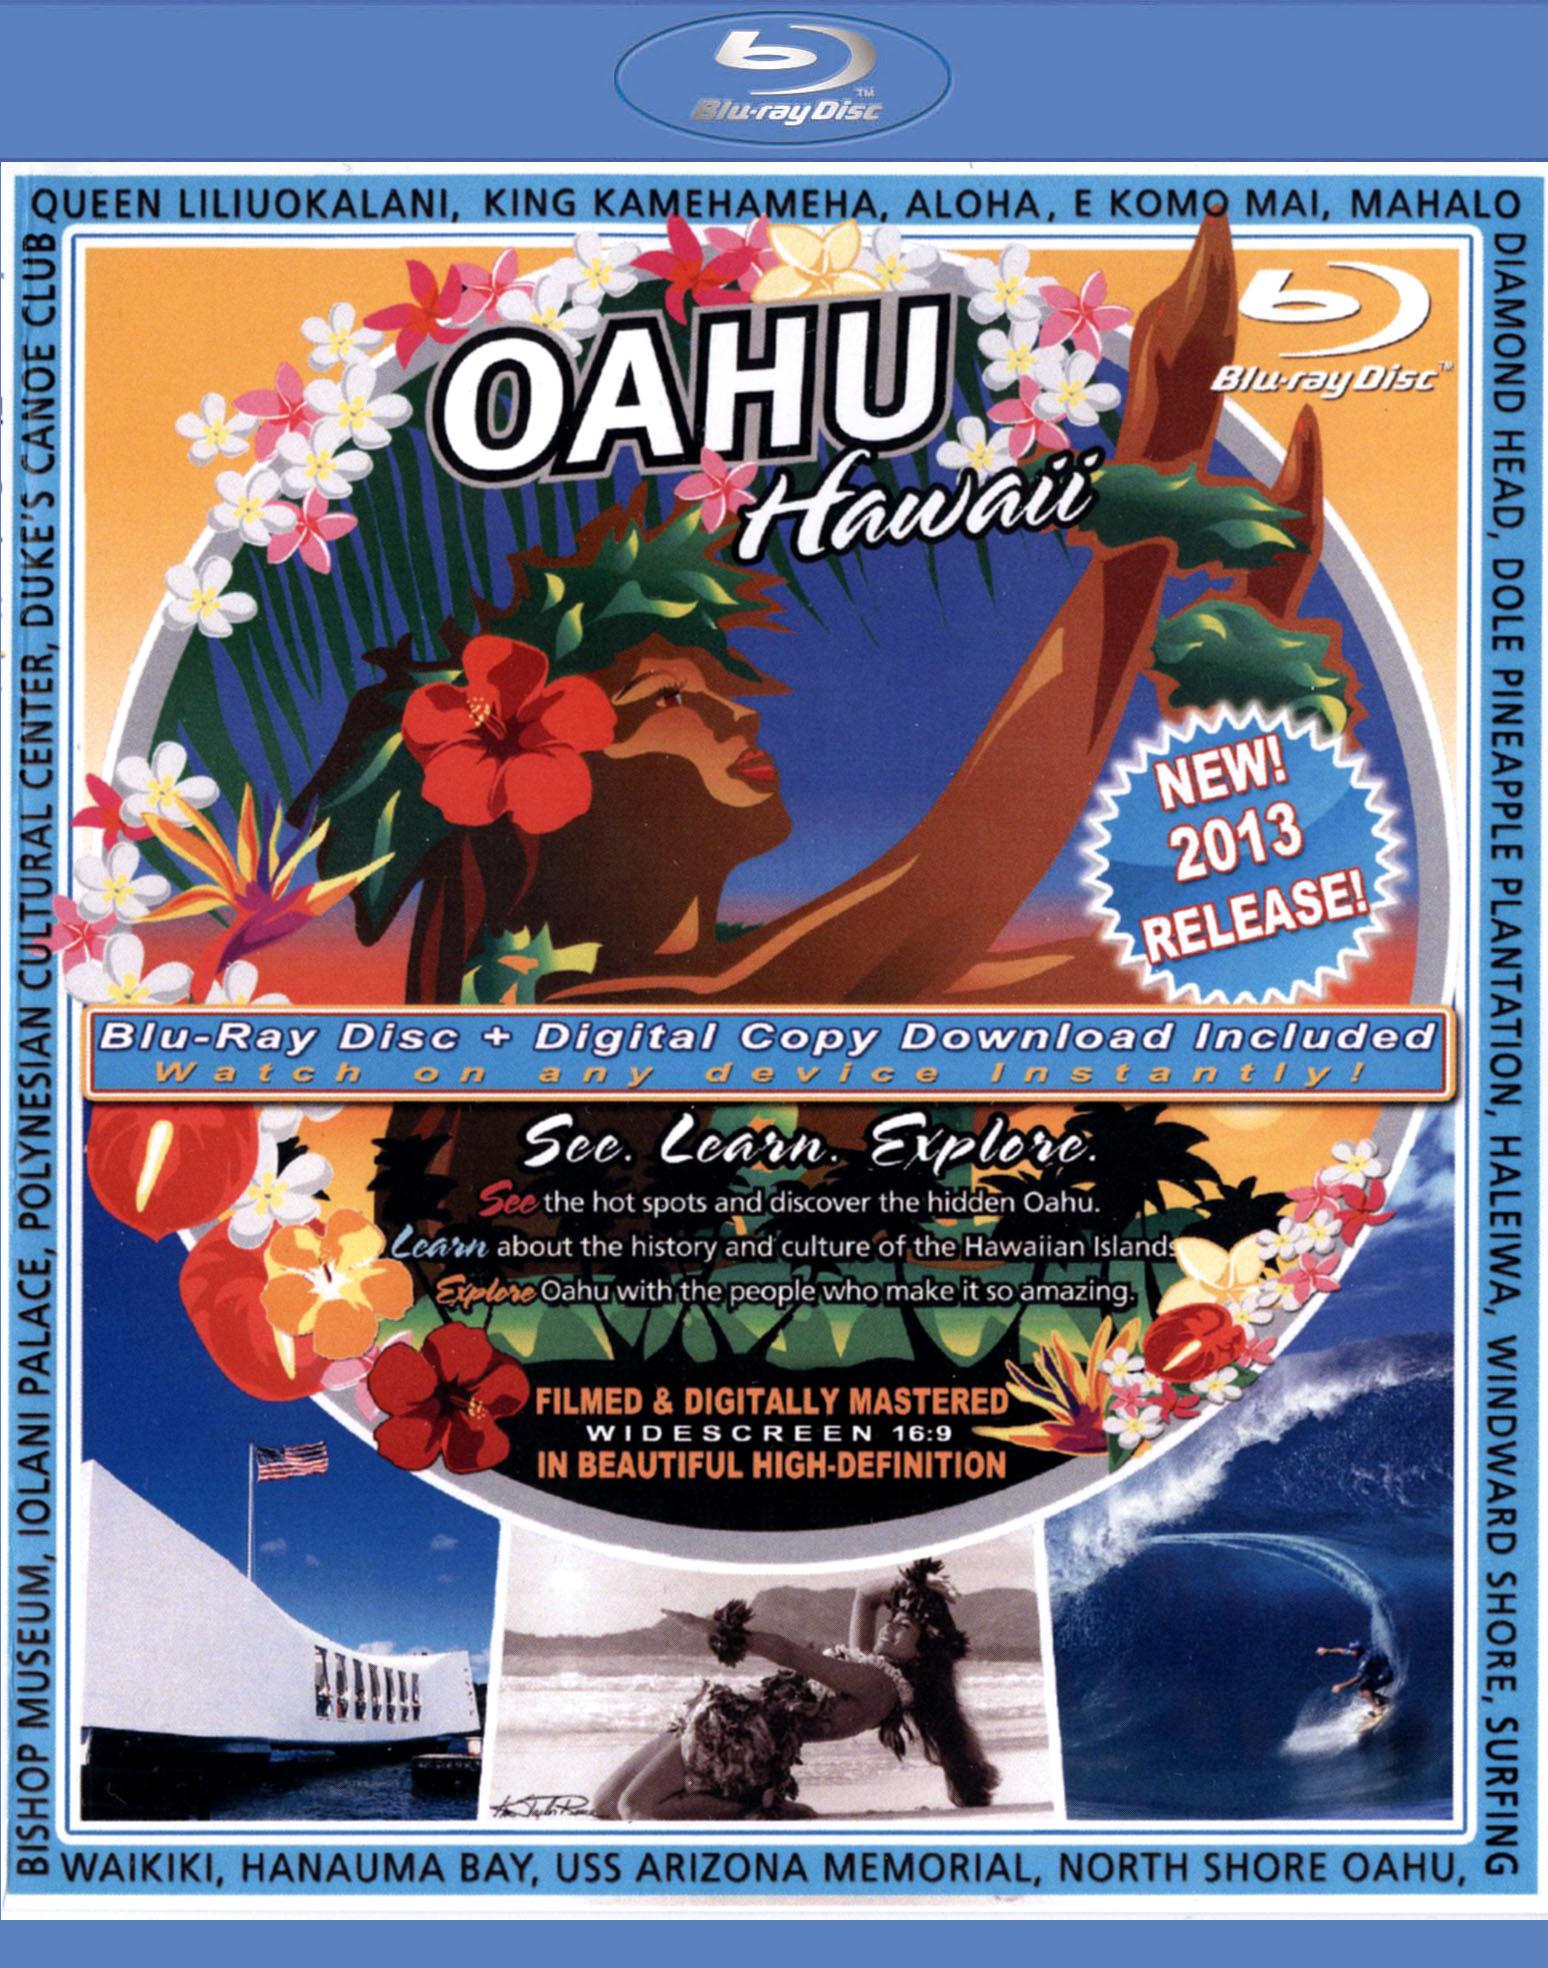 The Video Postcard of Oahu, Hawaii